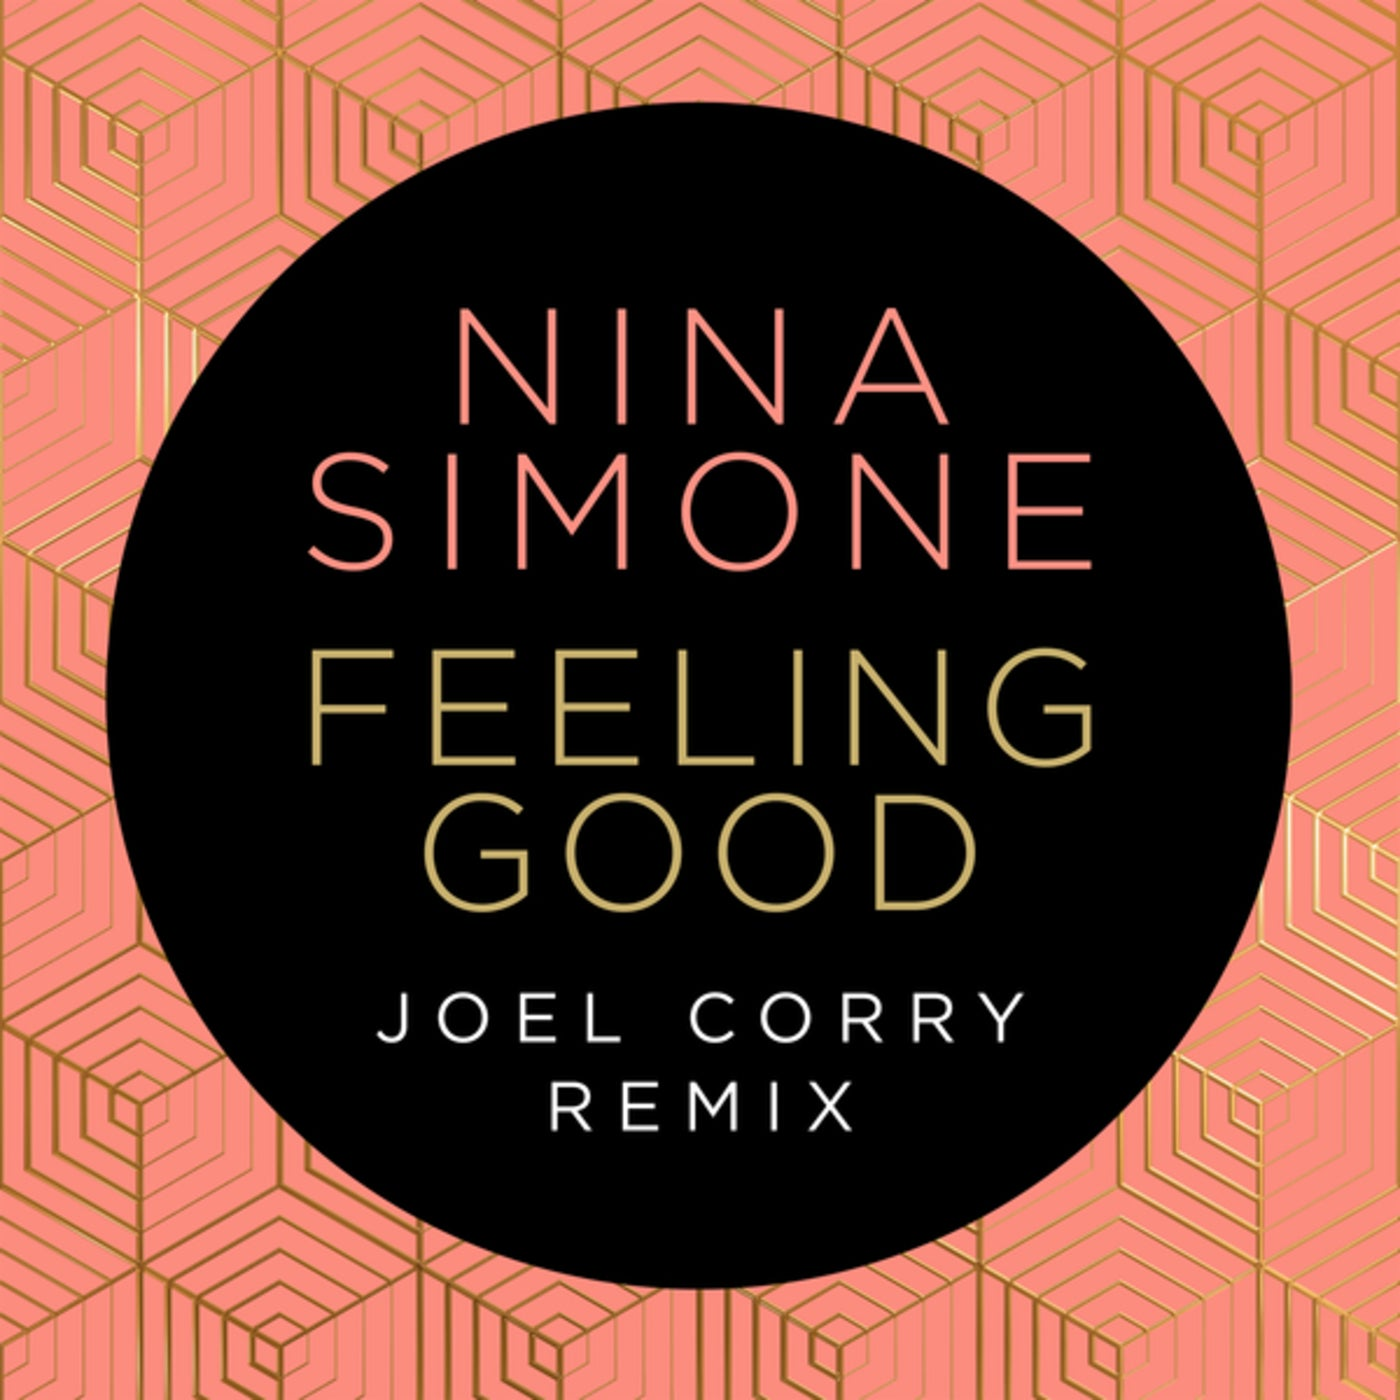 Feeling Good (Joel Corry Remix Extended)